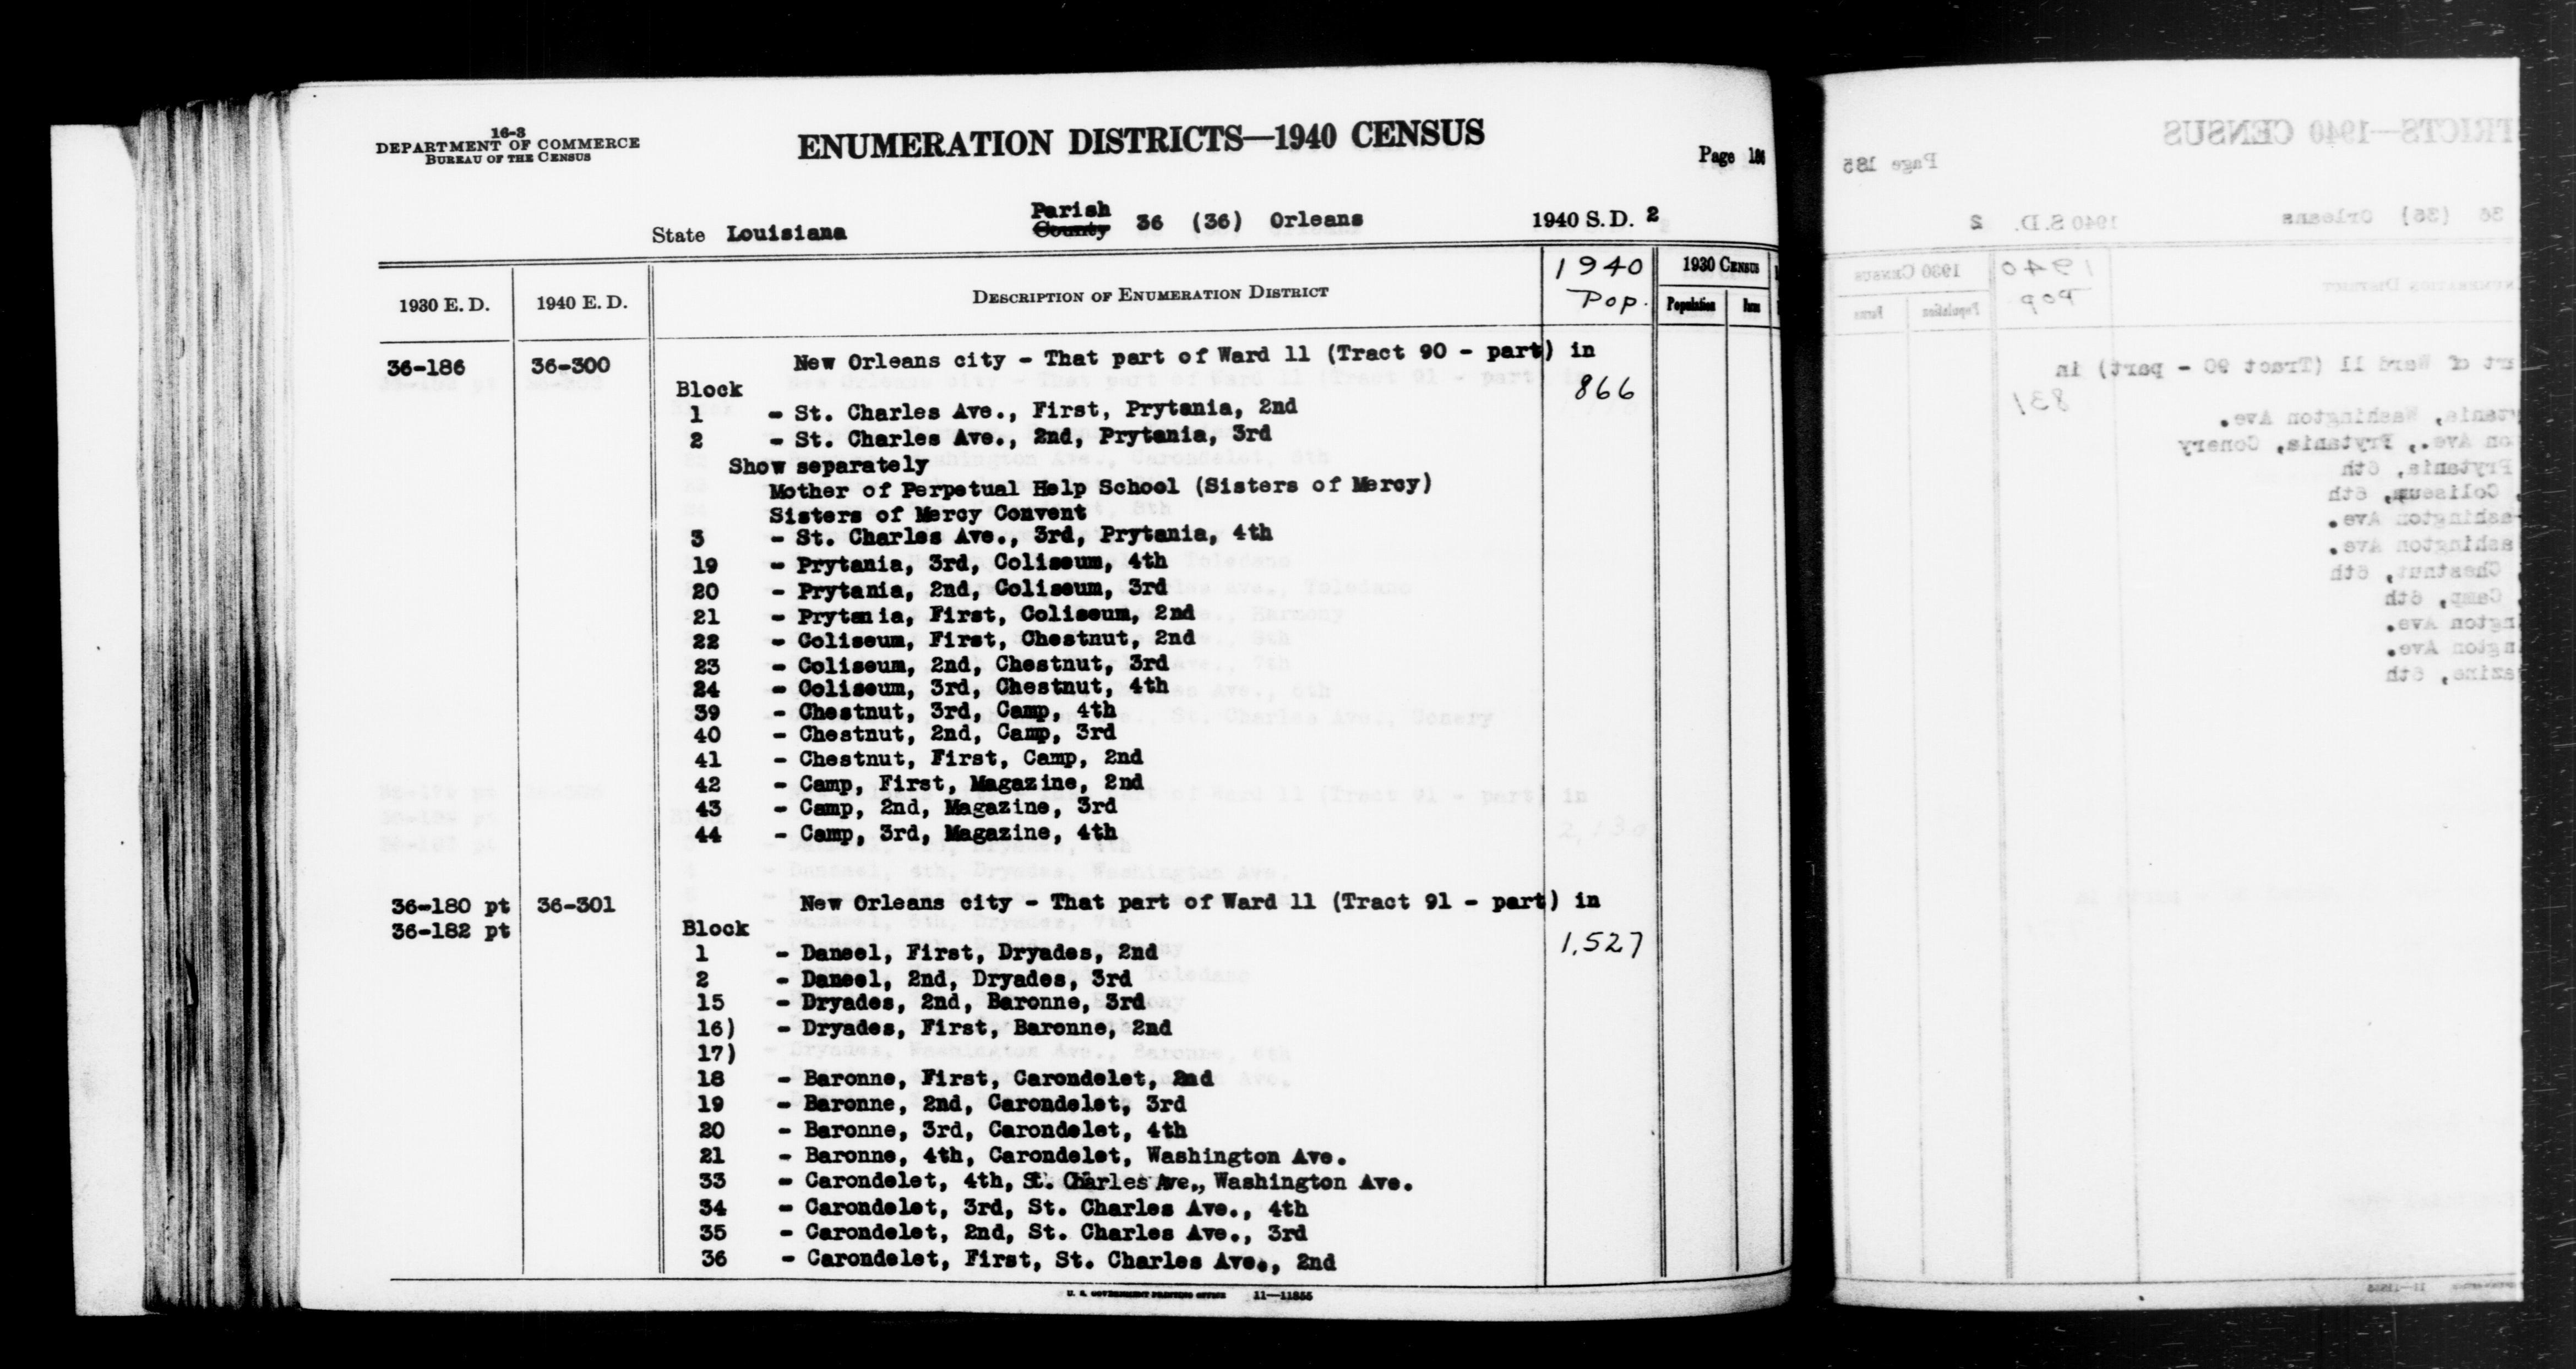 1940 Census Enumeration District Descriptions - Louisiana - Orleans County - ED 36-300, ED 36-301